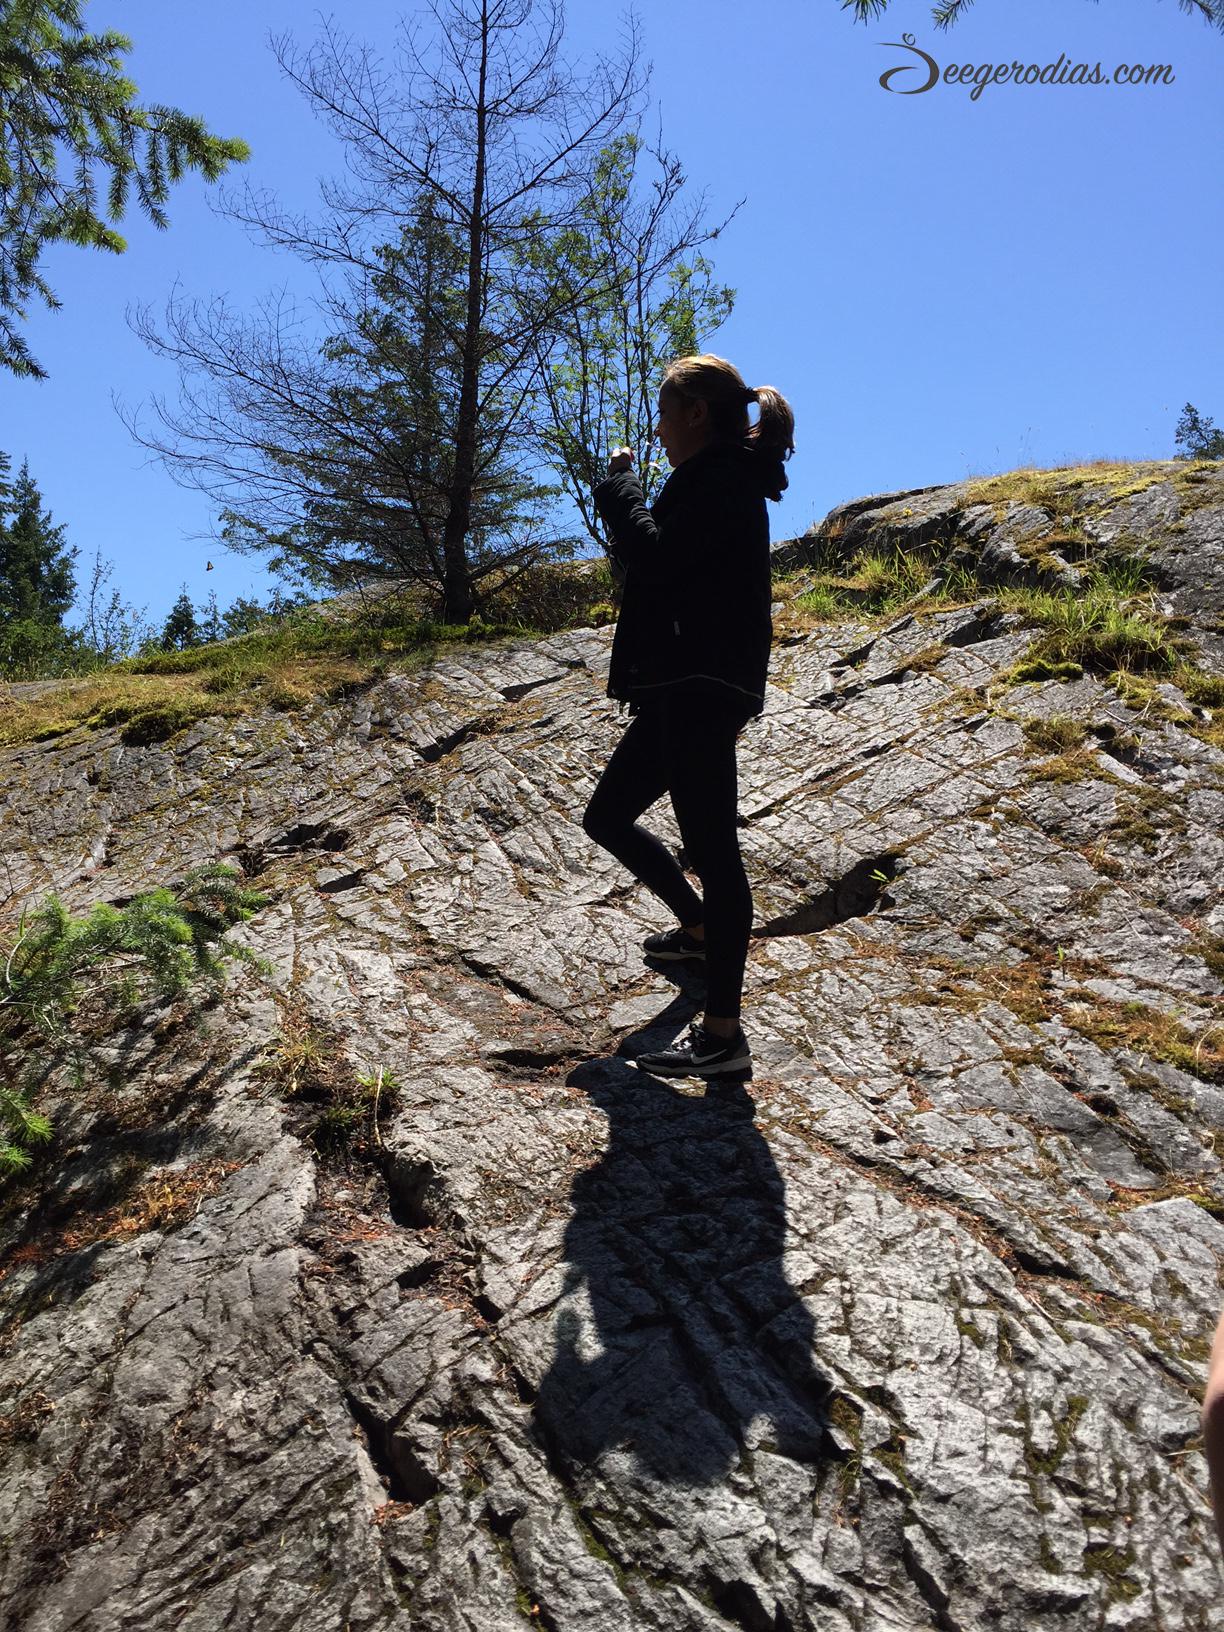 Climbing rocks and hills!